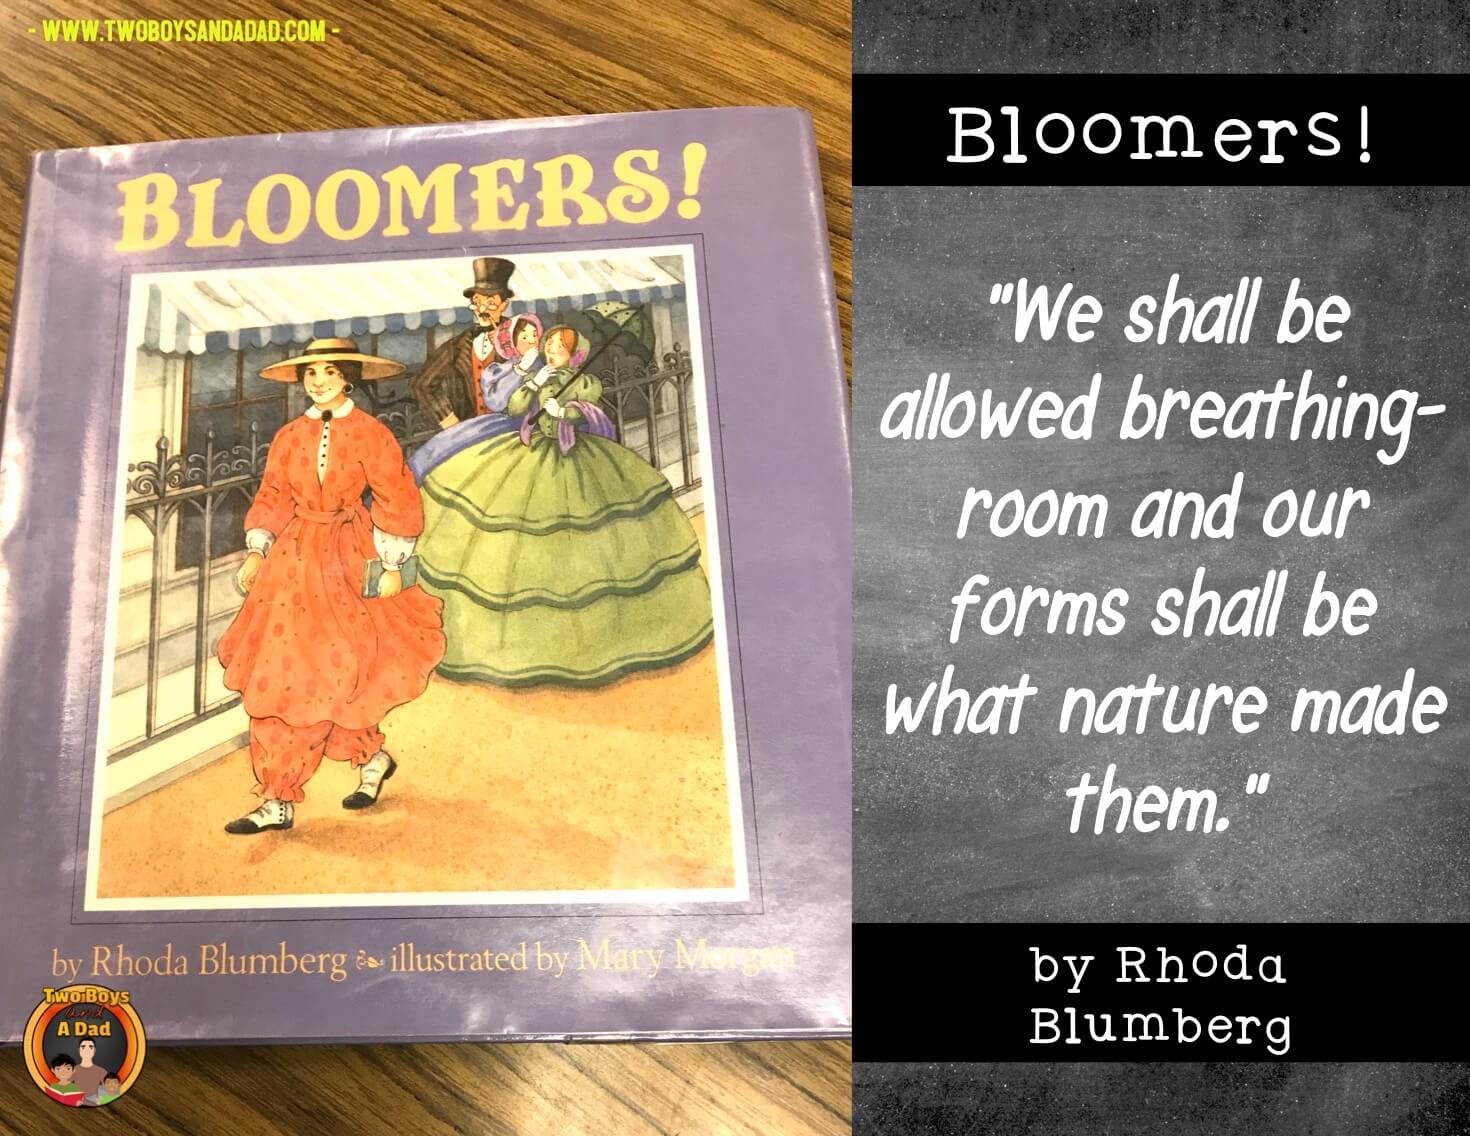 Amelia Bloomer inspiring woman